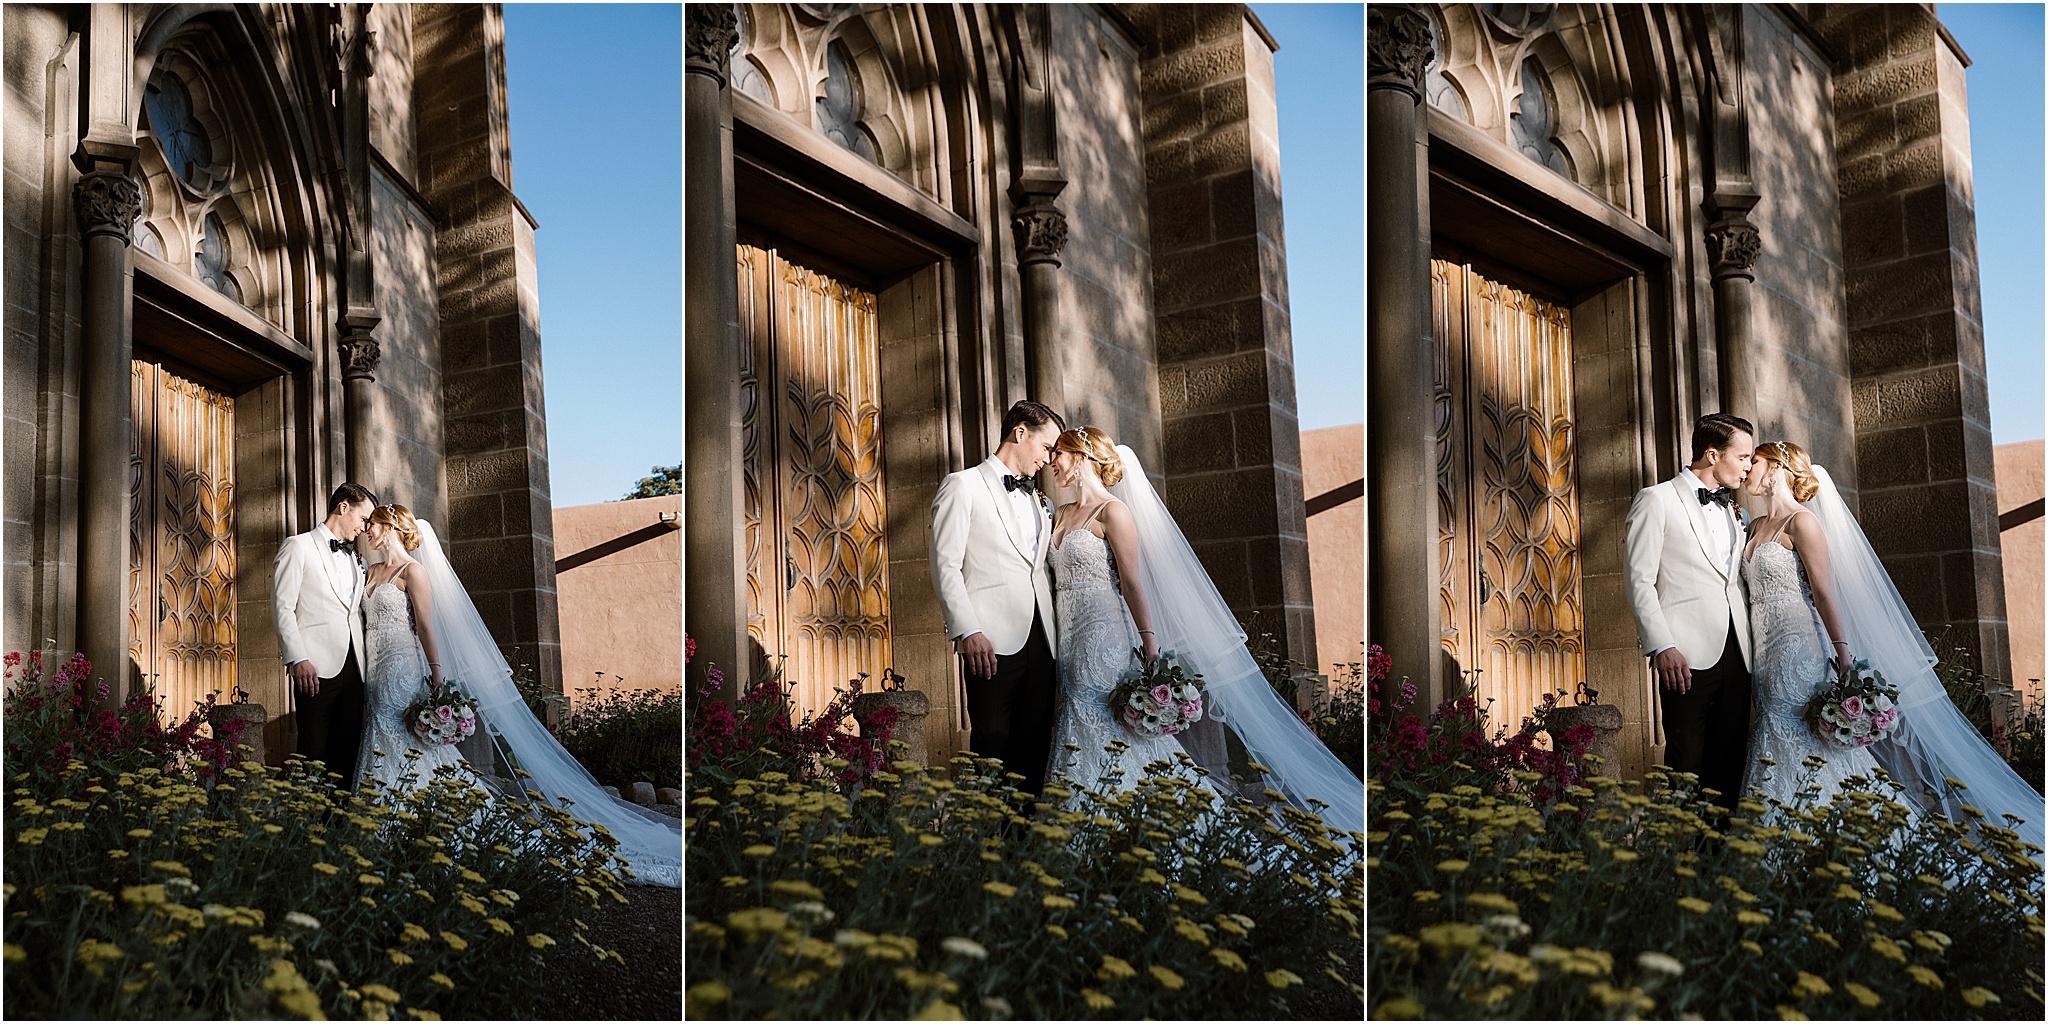 BLUE ROSE PHOTOGRAPHY SANTA FE WEDDING_33